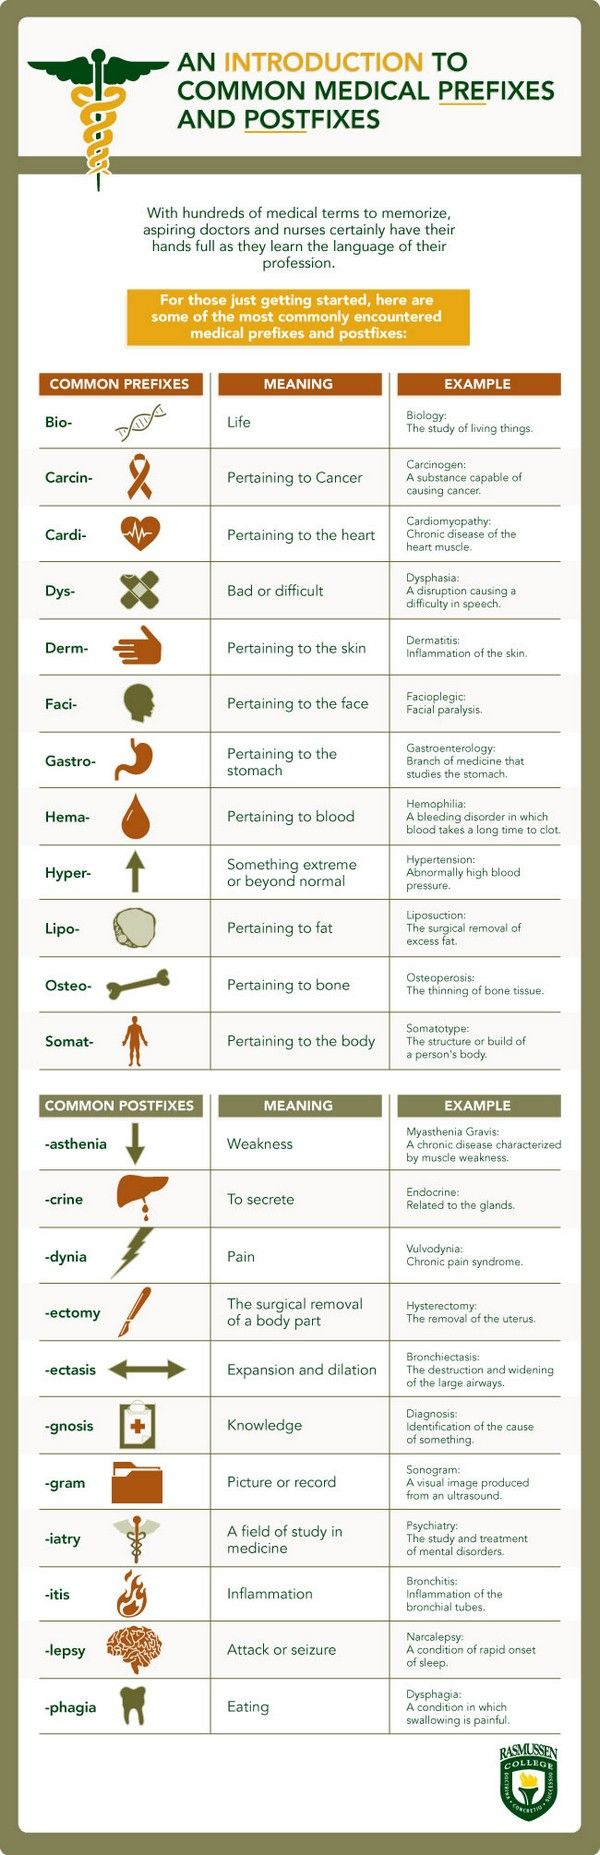 common medical prefixes and postfixes  infographic